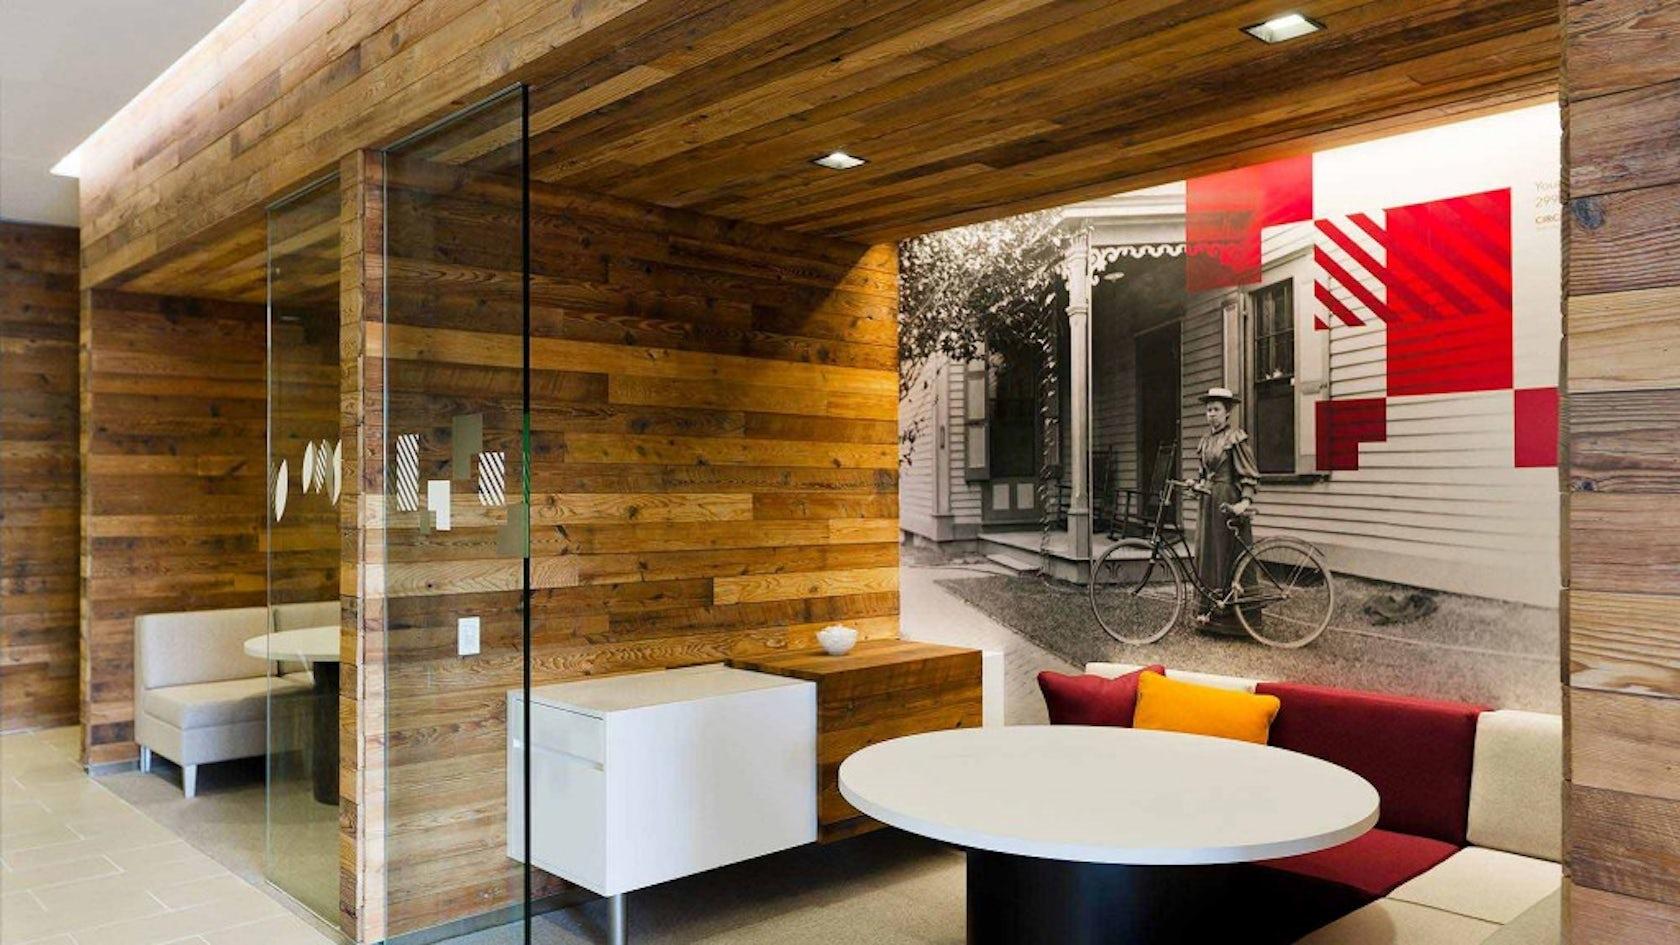 Horizon Blue Cross Blue Shield of New Jersey on Architizer